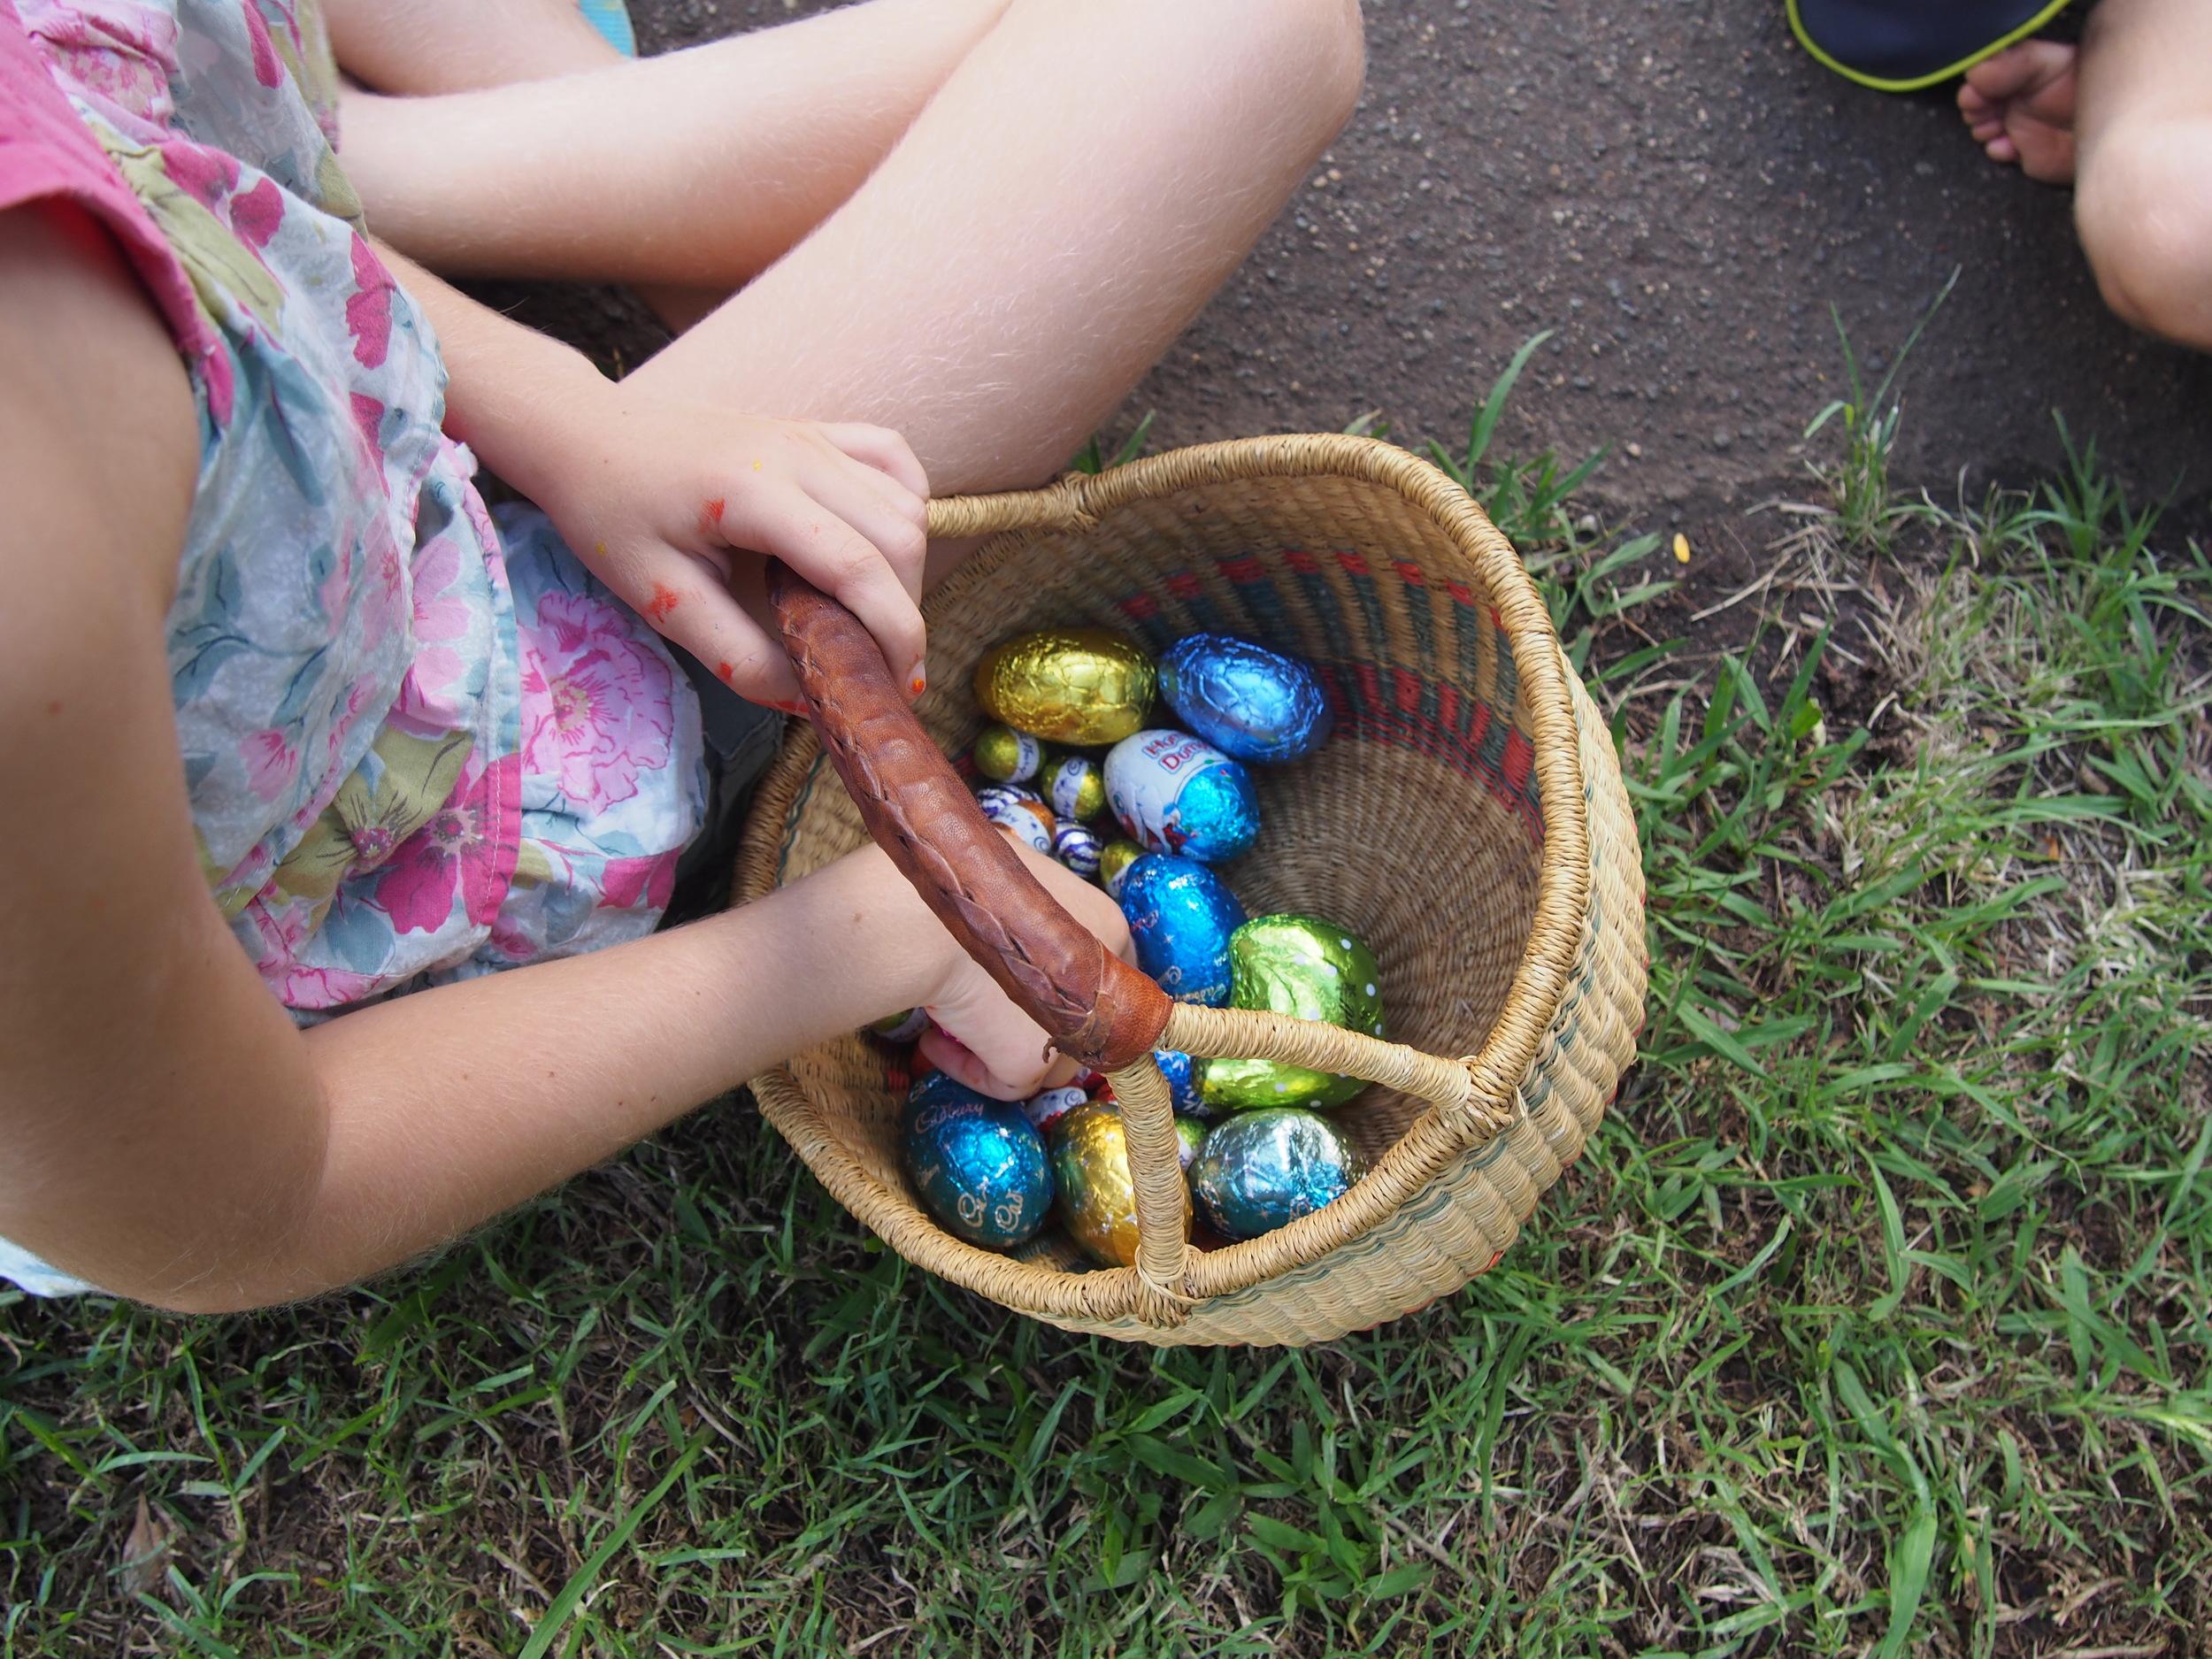 Eggs were gathered.